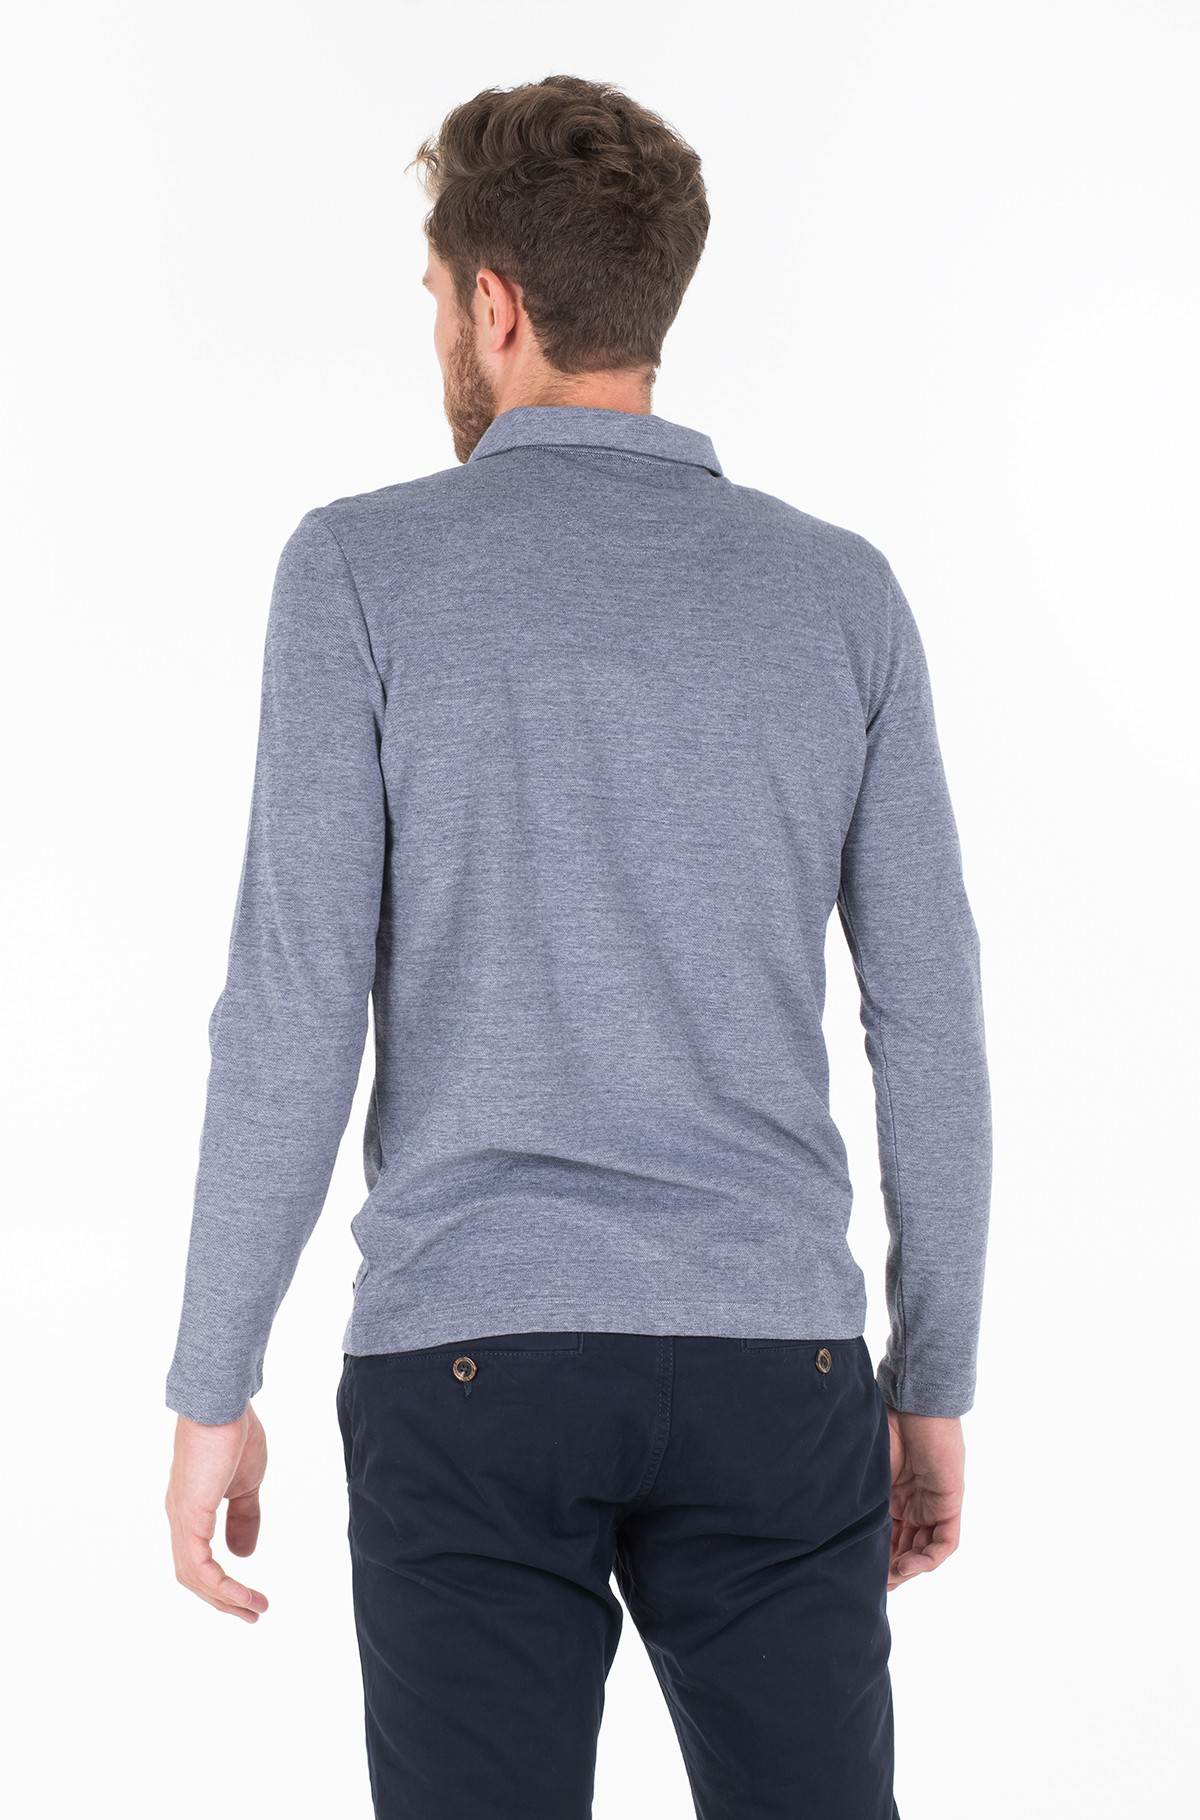 Polo marškinėliai ilgomis rankovėmis 53564-92316-full-2